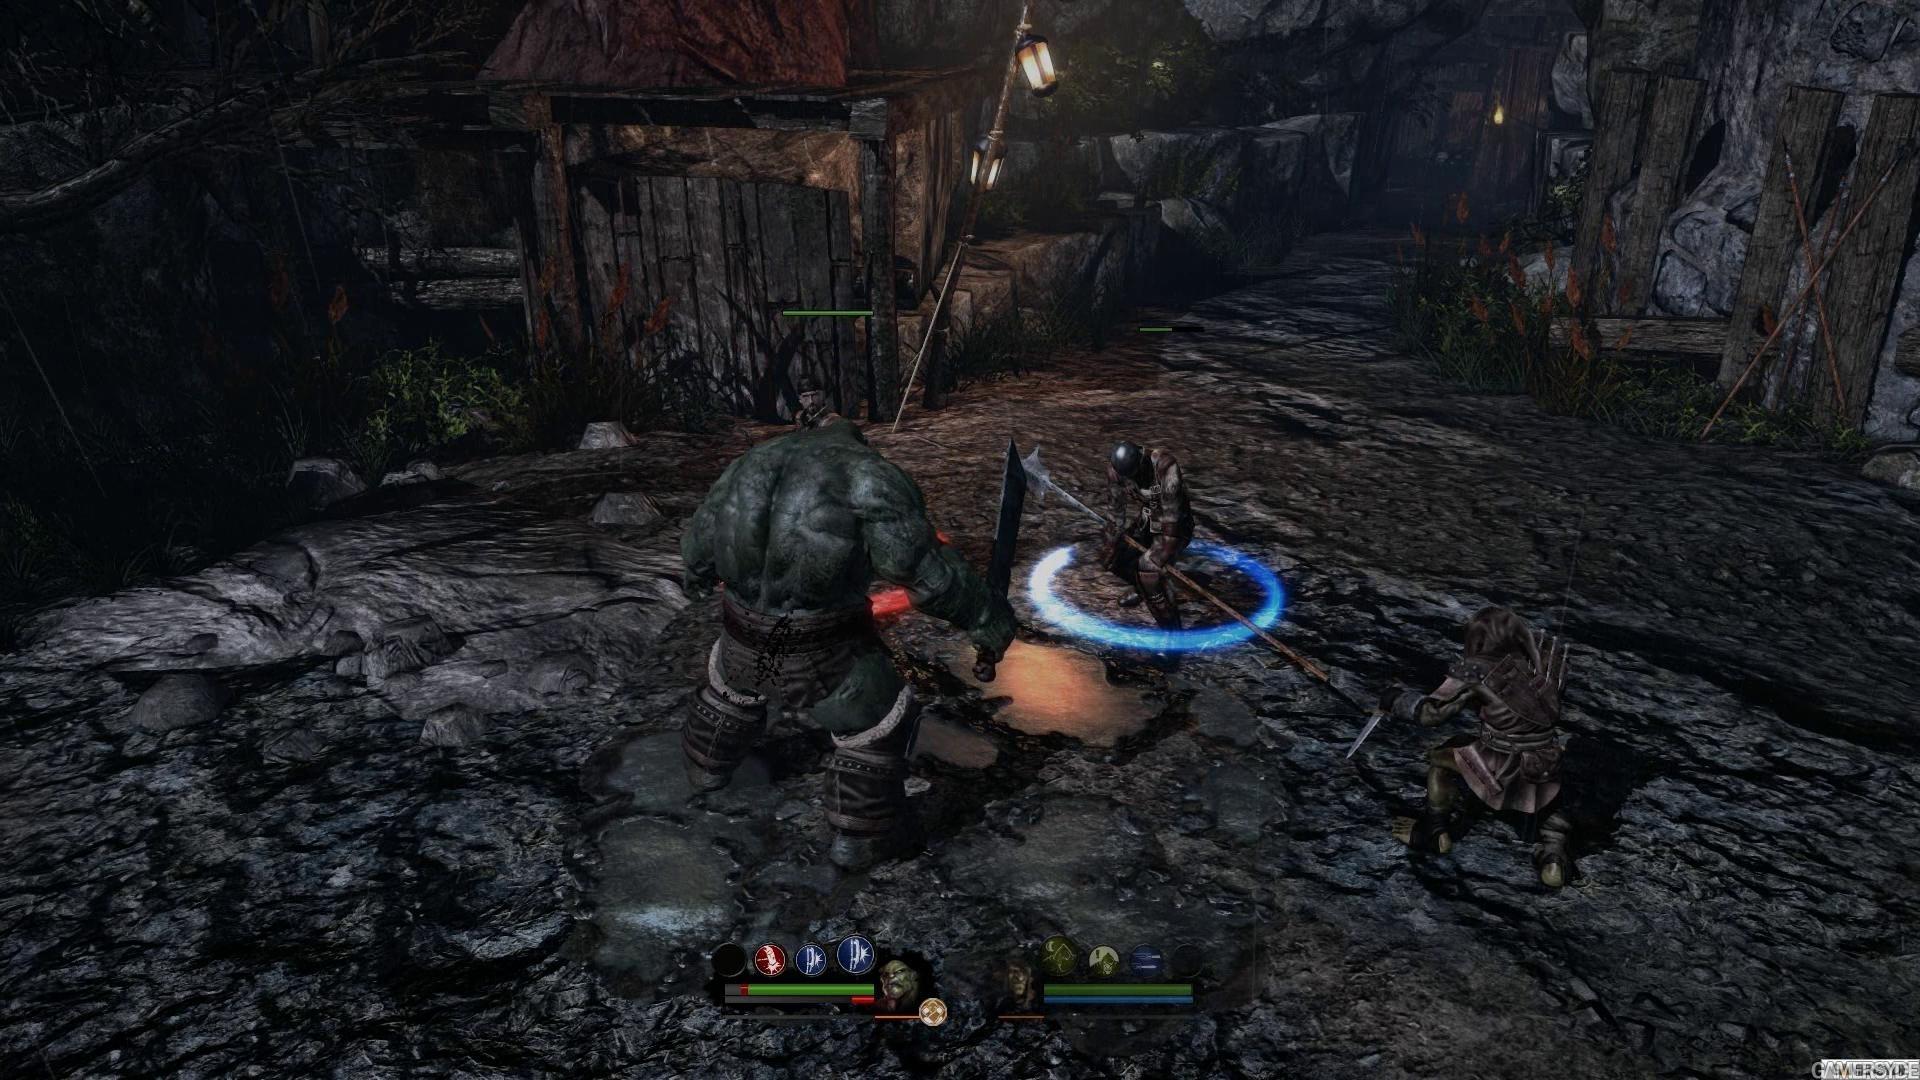 Код Активации К Игре Of Orcs And Men